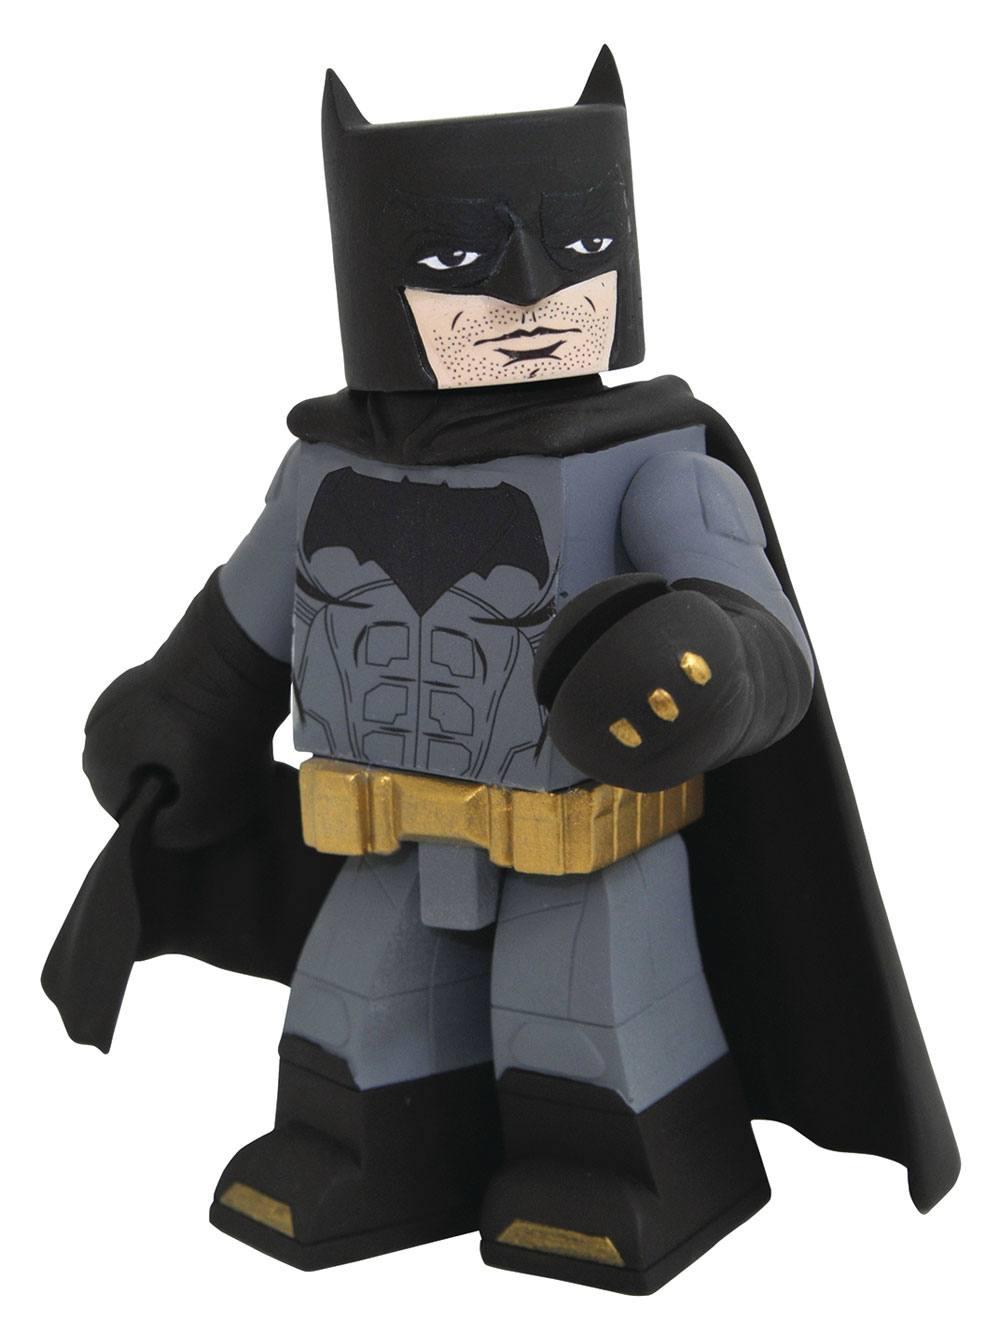 Justice League Movie Vinimates Figure Batman 10 cm